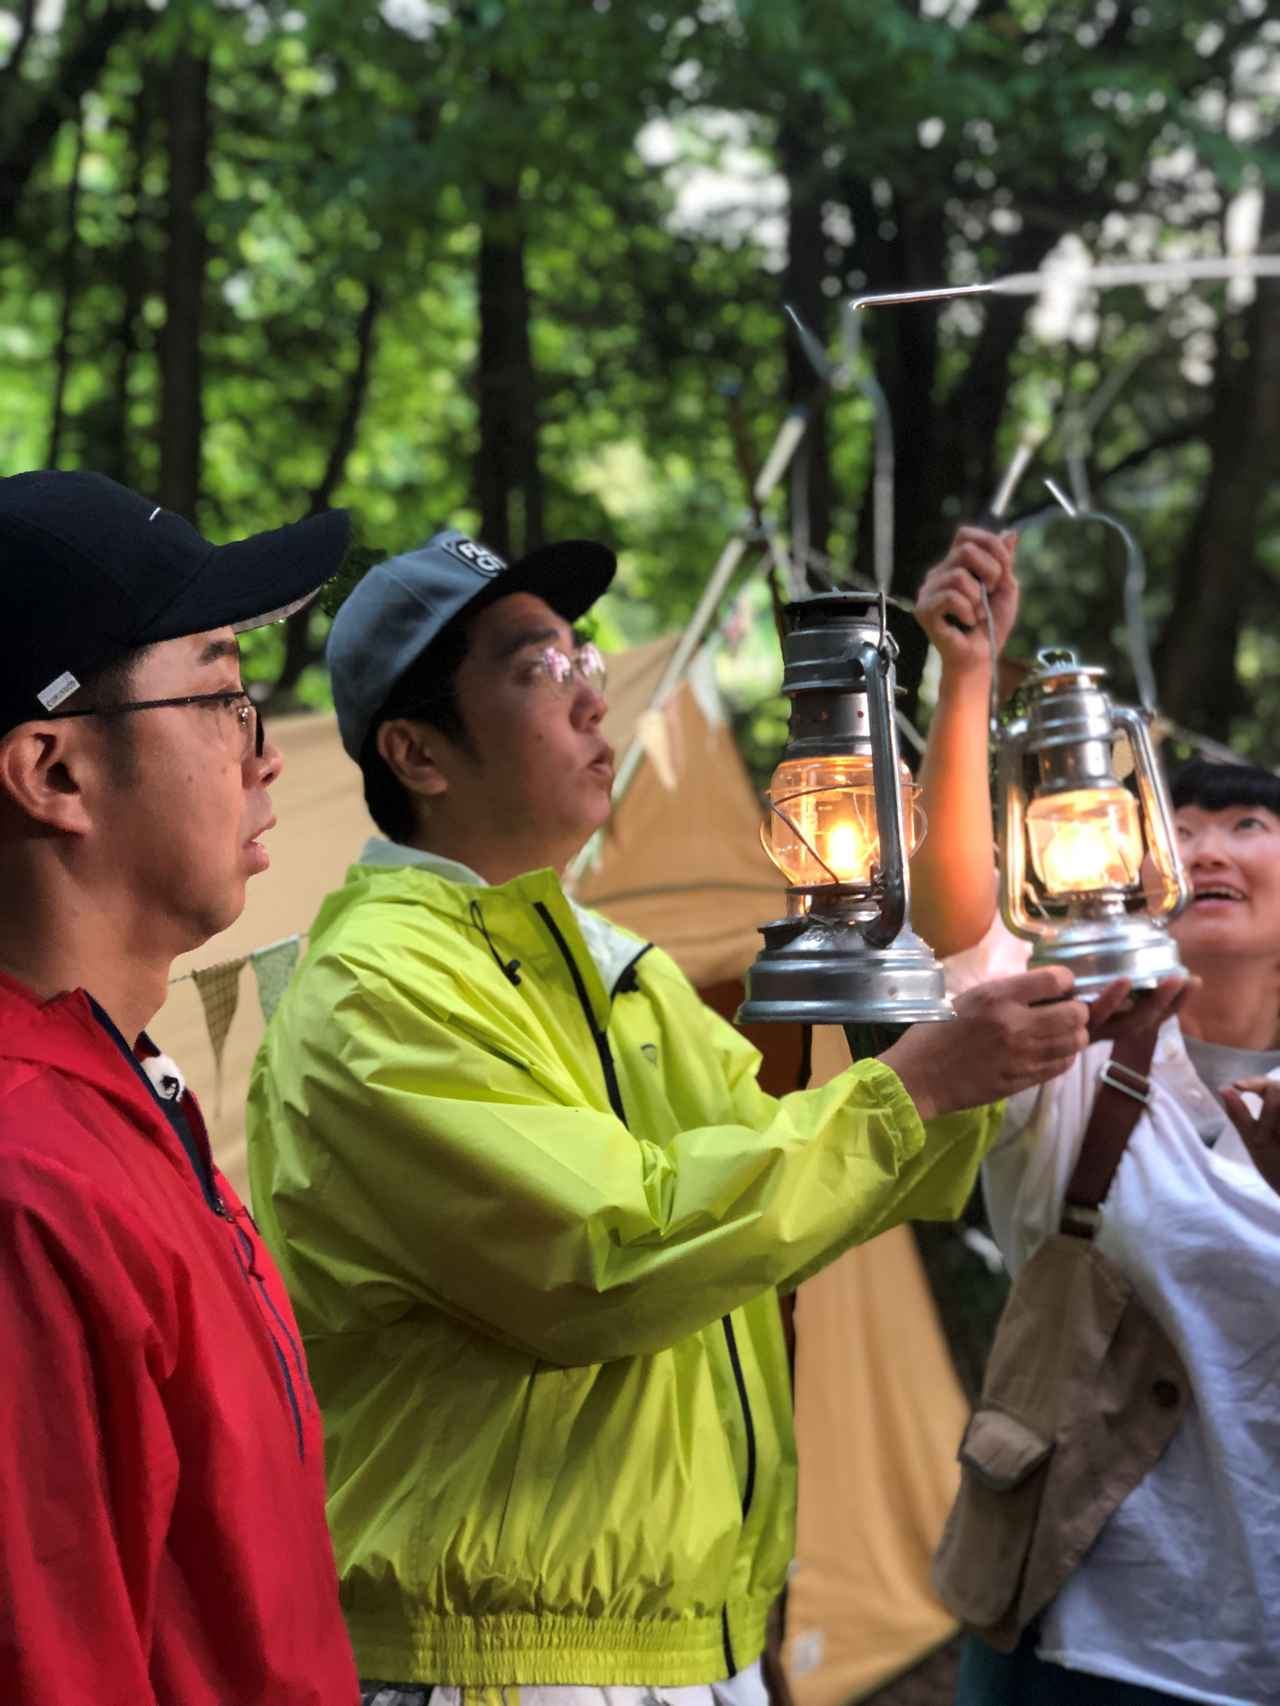 Images : 14番目の画像 - おぎやはぎのハピキャン「映えキャンプ」写真集 - ハピキャン|キャンプ・アウトドア情報メディア